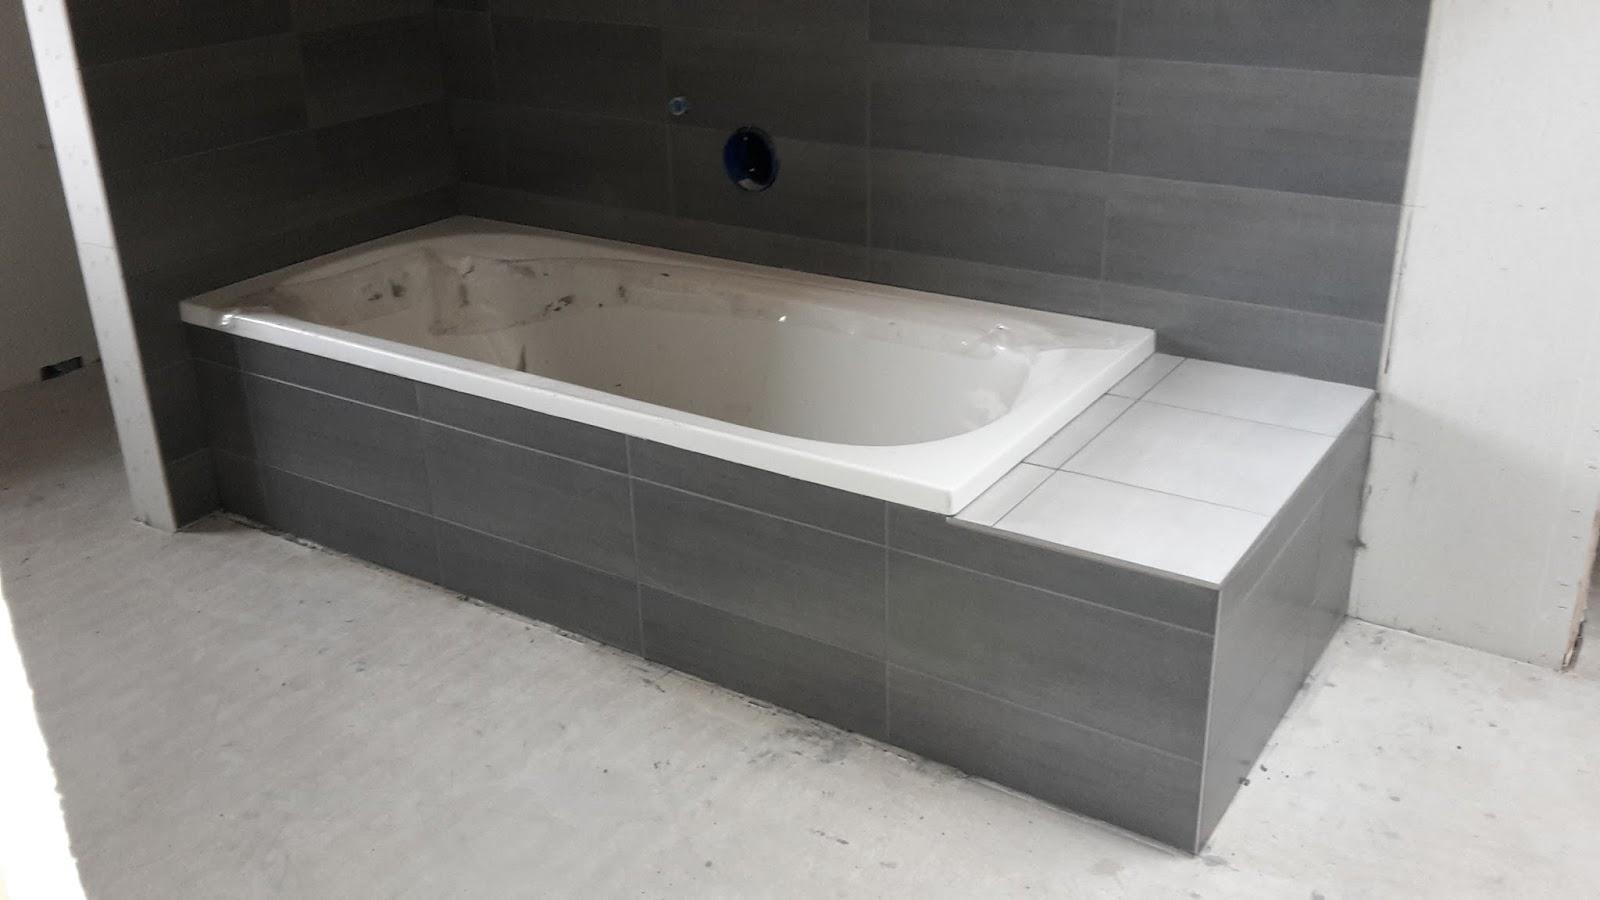 jenny und lars bauen ein haus au en hui. Black Bedroom Furniture Sets. Home Design Ideas